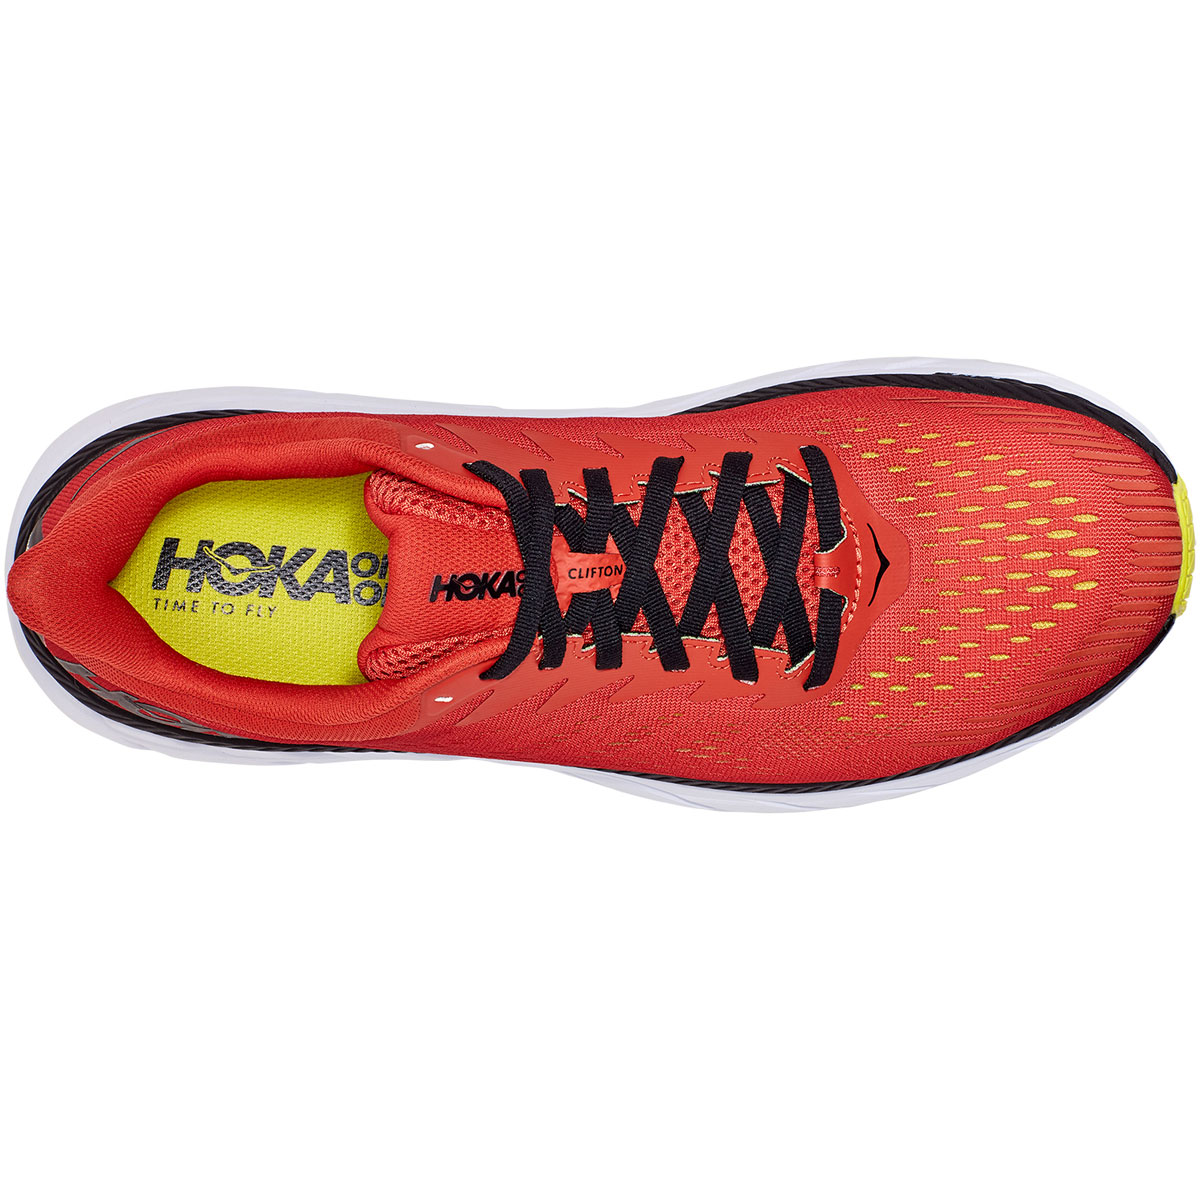 Men's Hoka One One Clifton 7 Running Shoe - Color: Chili/Black - Size: 9 - Width: Regular, Chili/Black, large, image 2